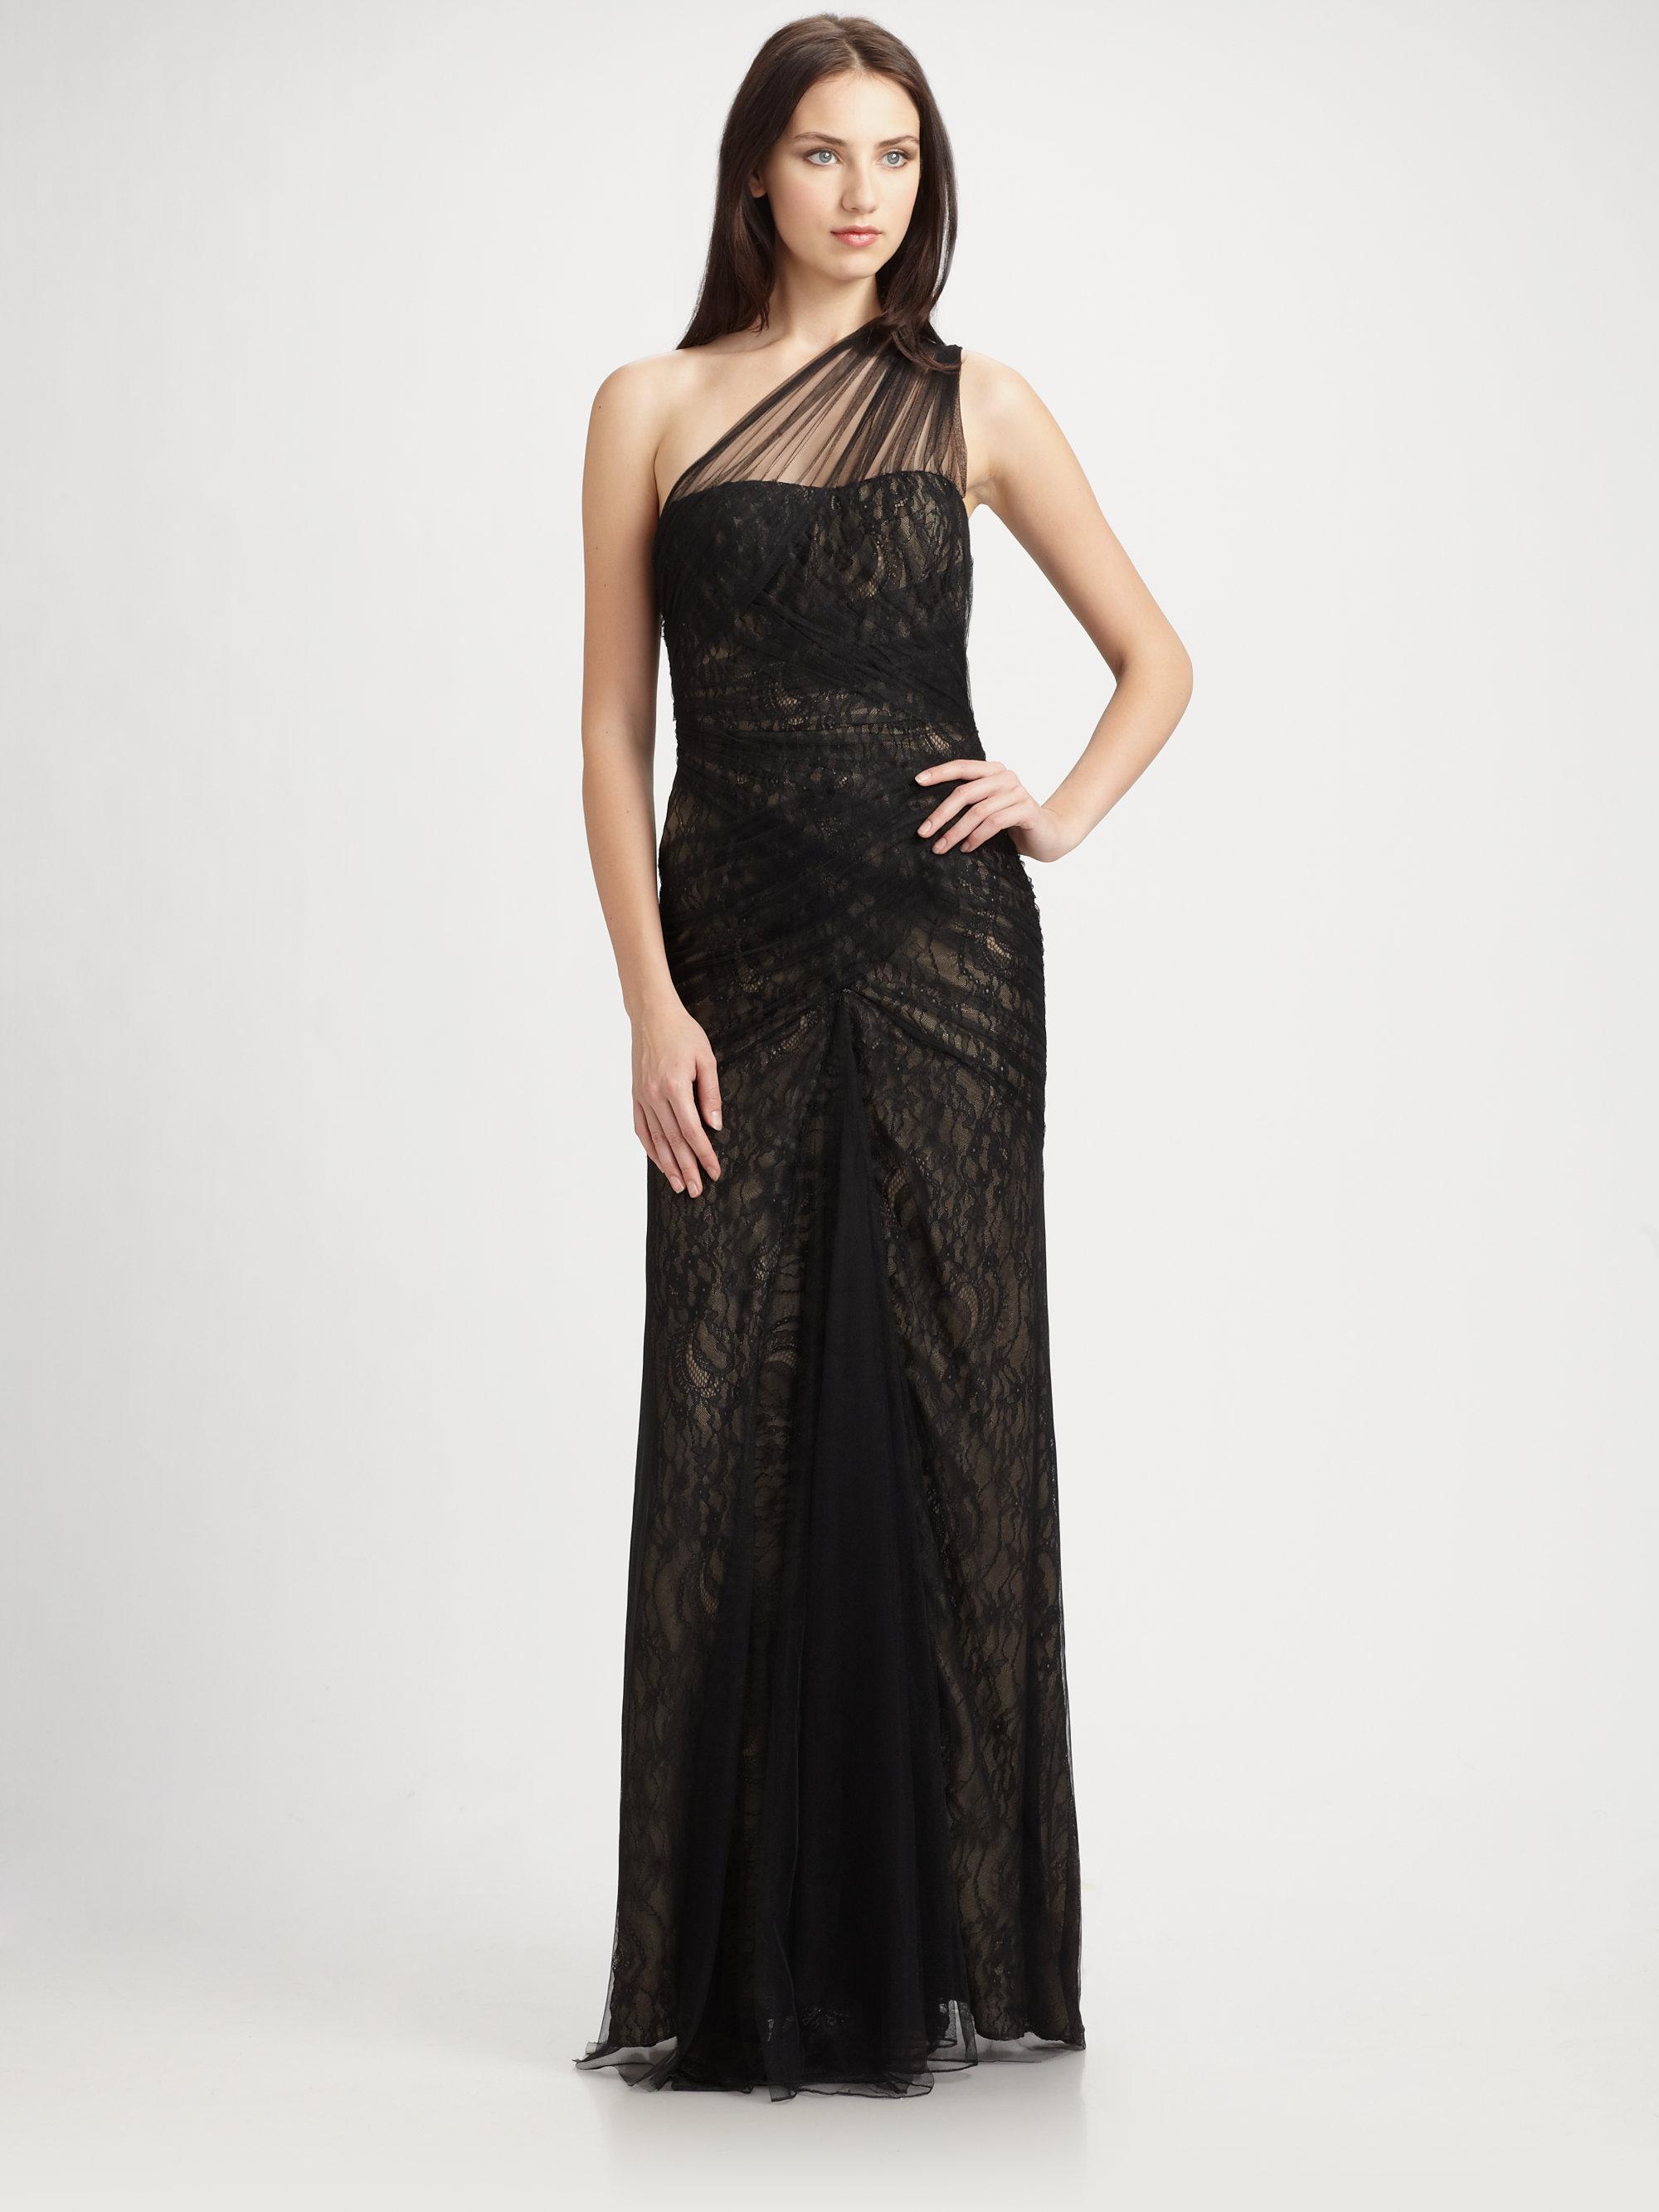 Monique Lhuillier Lace-Bodice Jersey Gown ($4,590) found